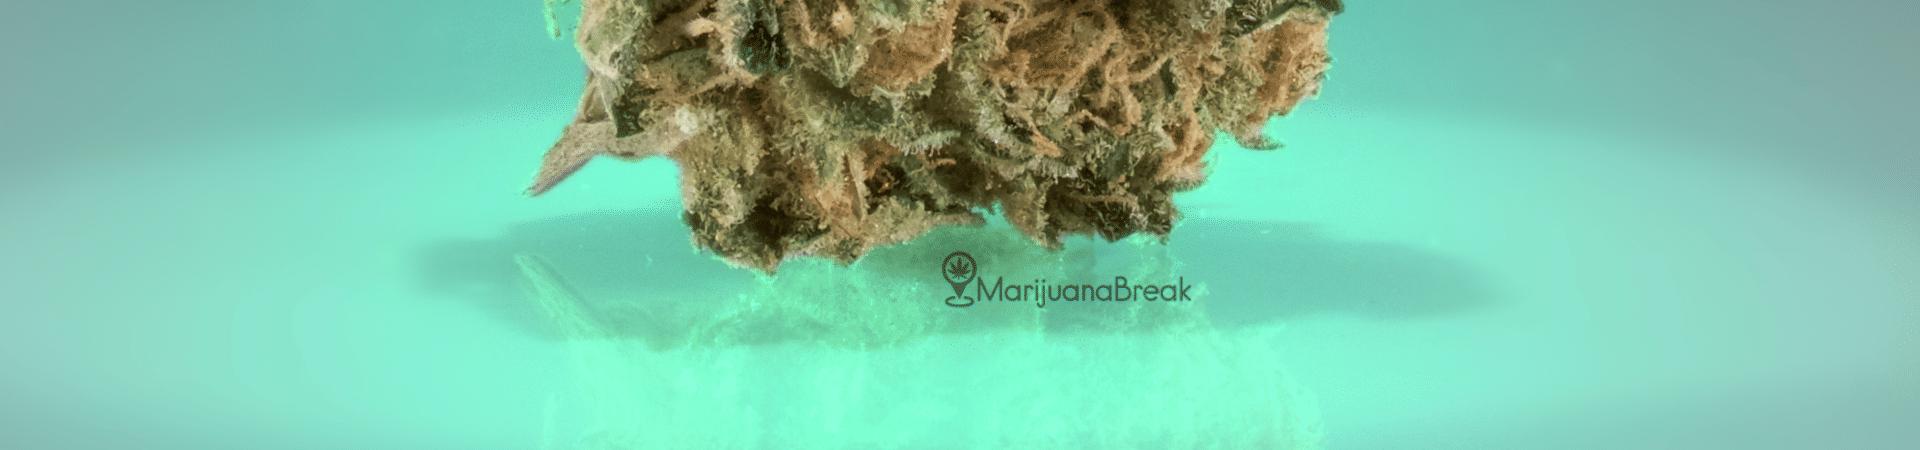 trainwreck marijuana cannabis strain